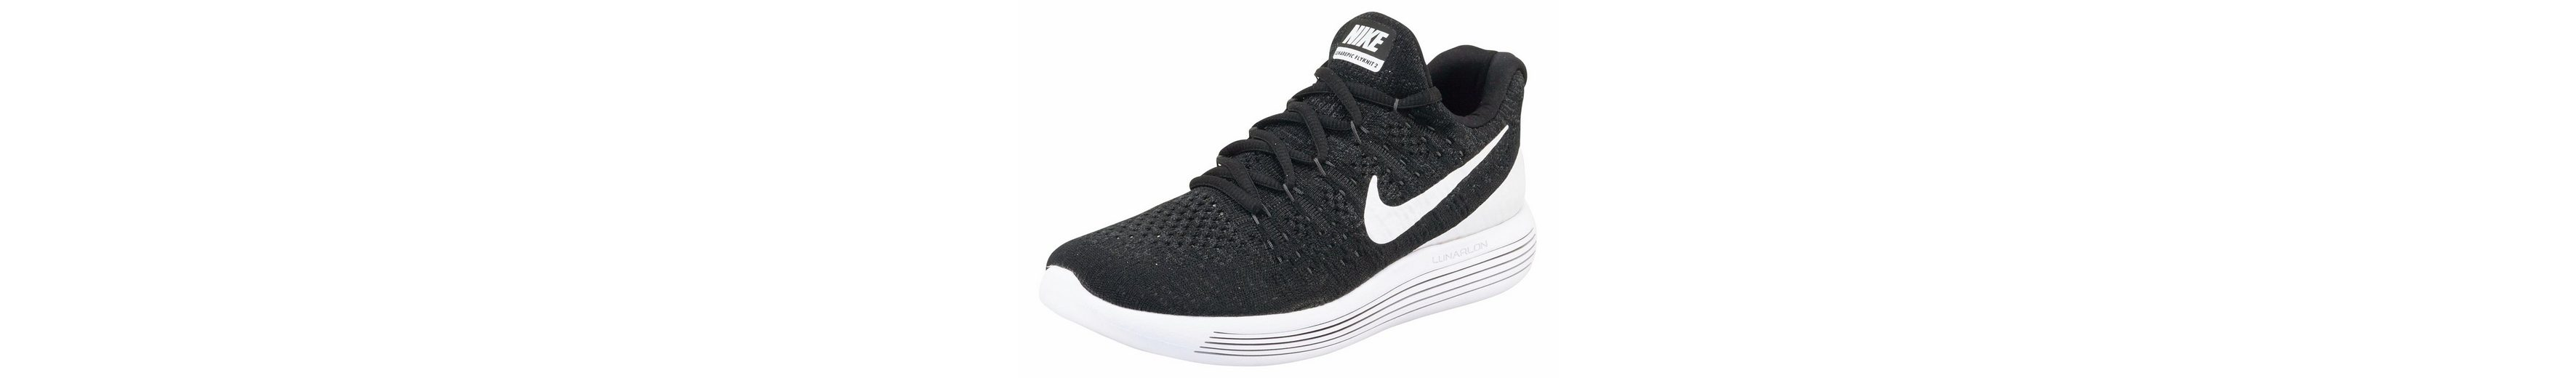 Nike Wmns Lunarepic Low Flyknit 2 Laufschuh